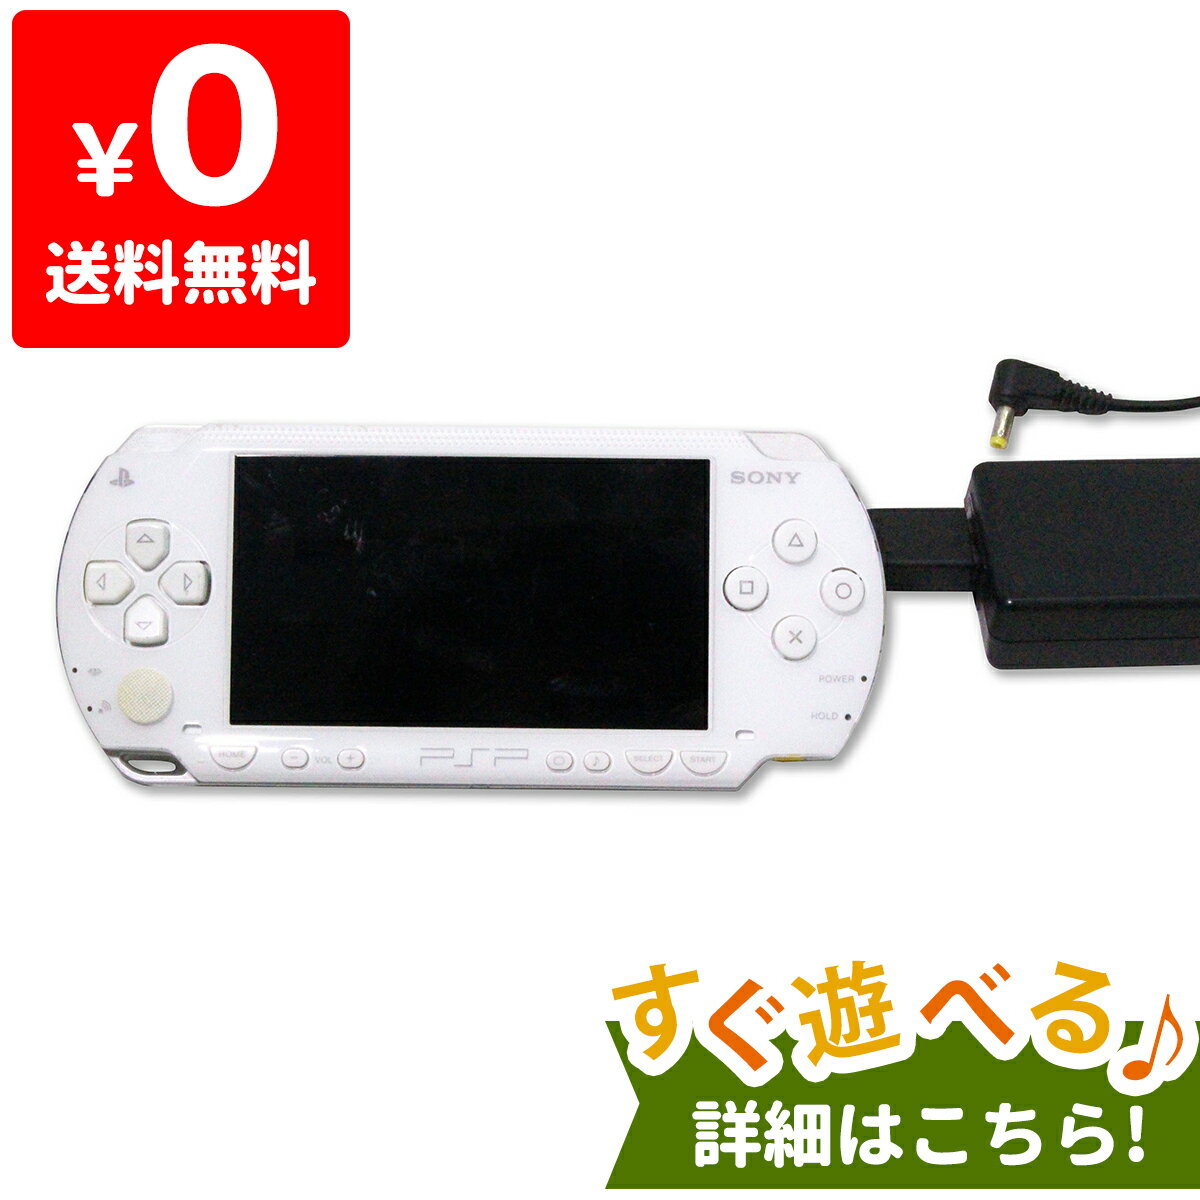 PSP 1000 セラミック・ホワイト (PSP-1000CW) 本体 すぐ遊べるセット PlayStationPortable SONY ソニー 中古 4948872411219 送料無料 【中古】